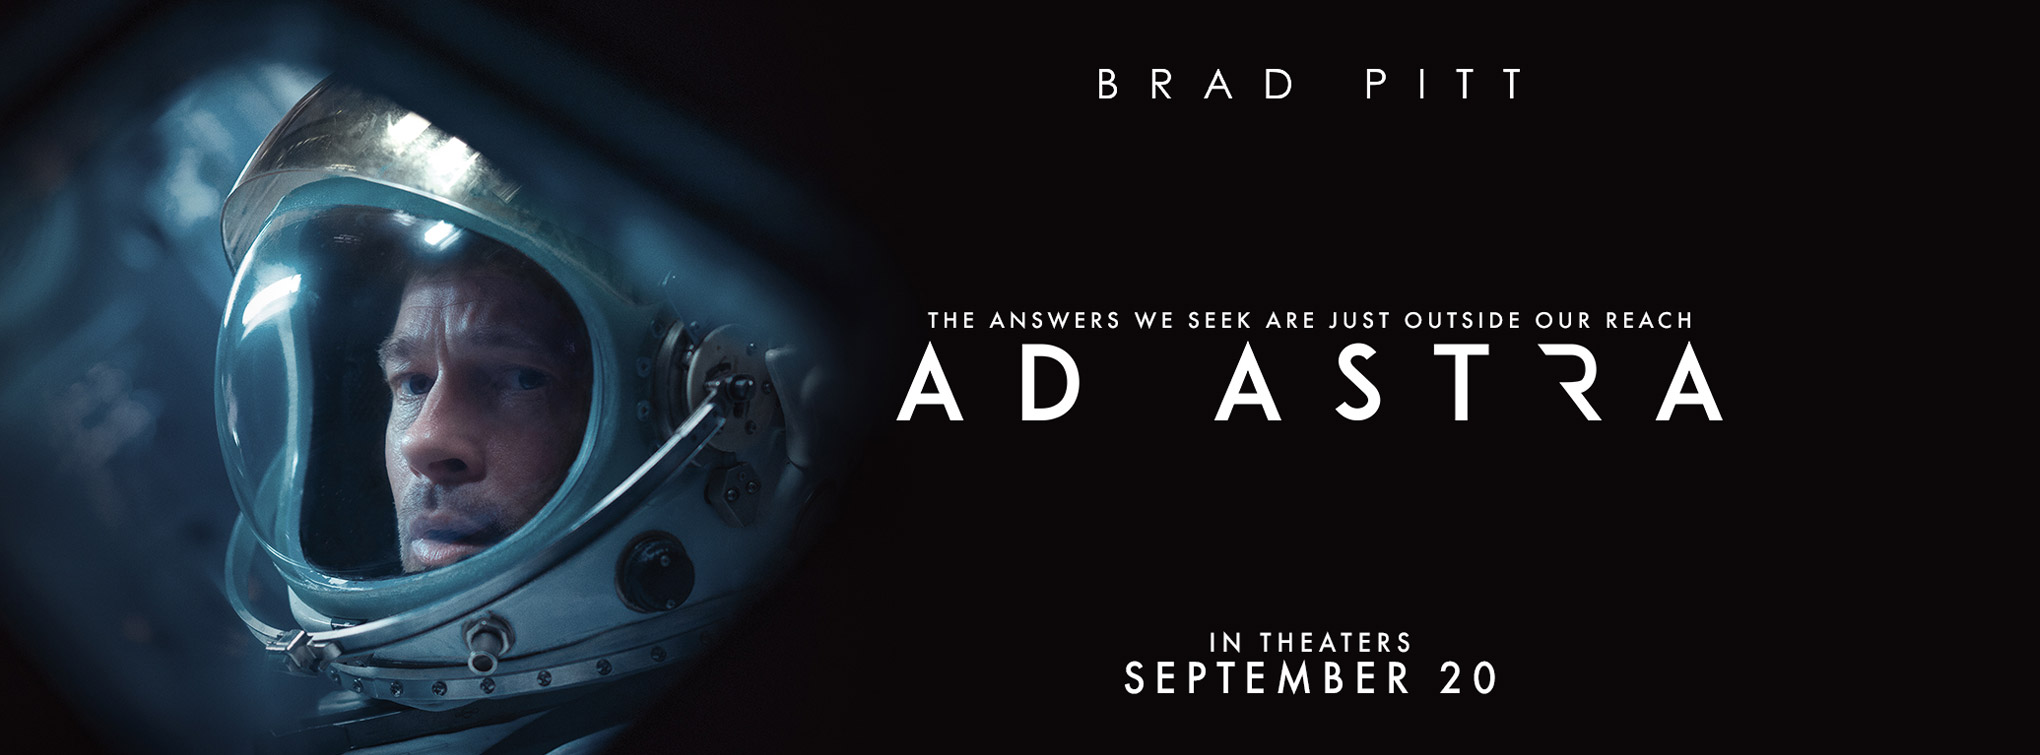 Slider image for Ad Astra